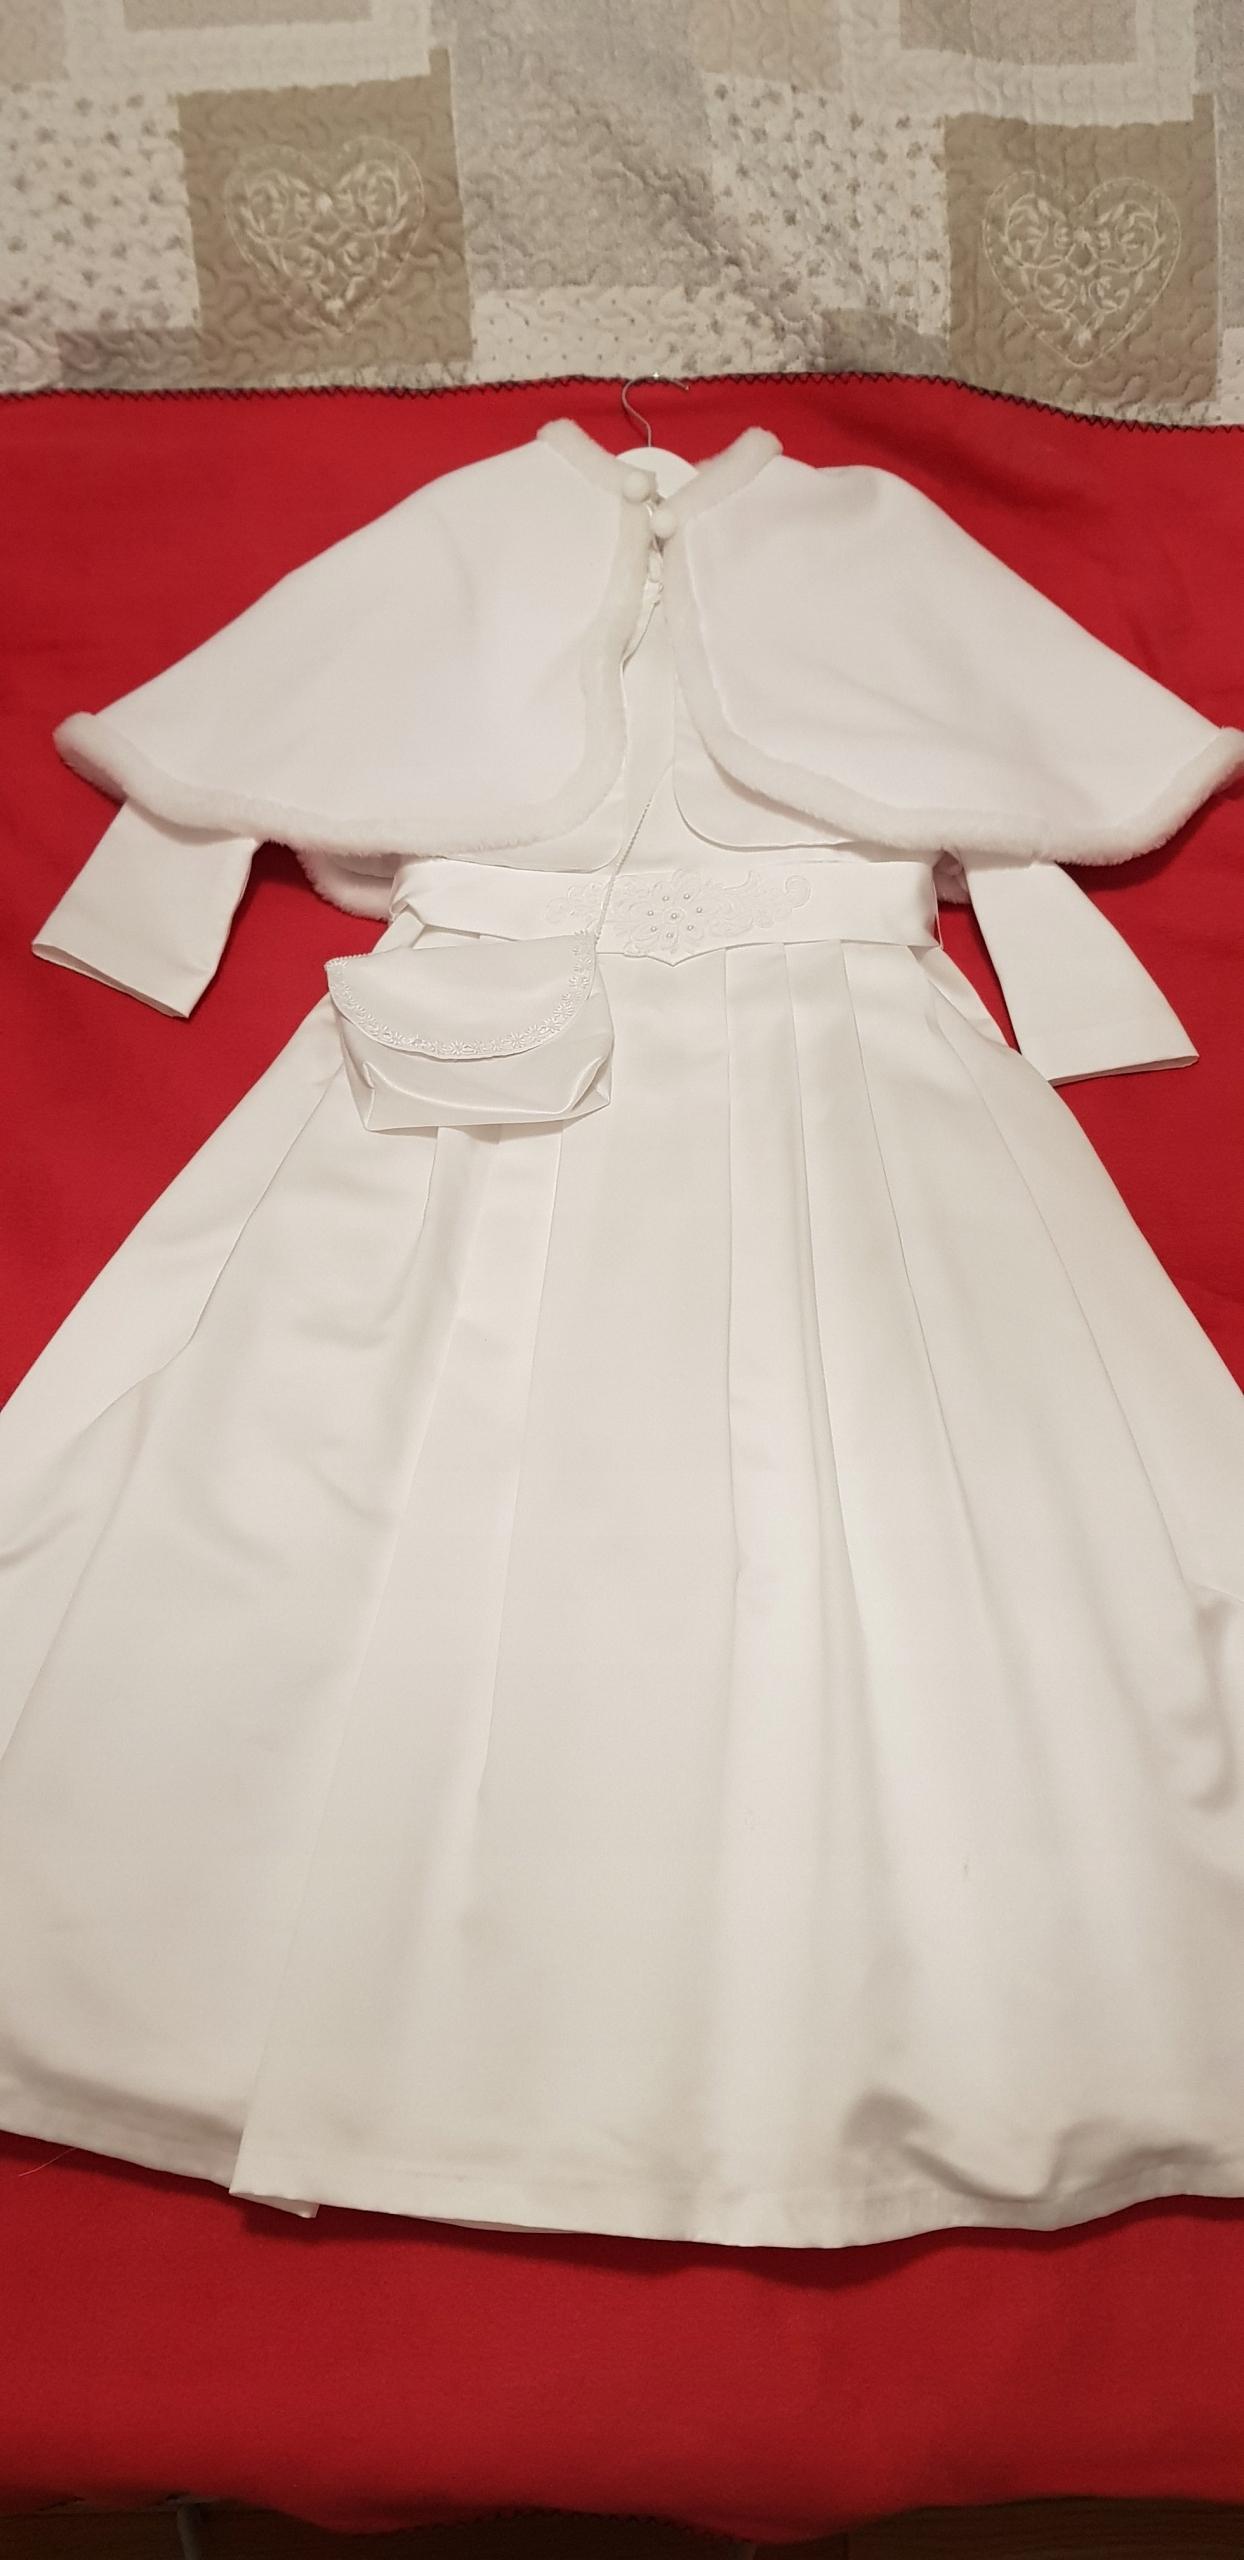 eba2126252 Sukienka komunijna 146 152 cm - 7657697171 - oficjalne archiwum allegro